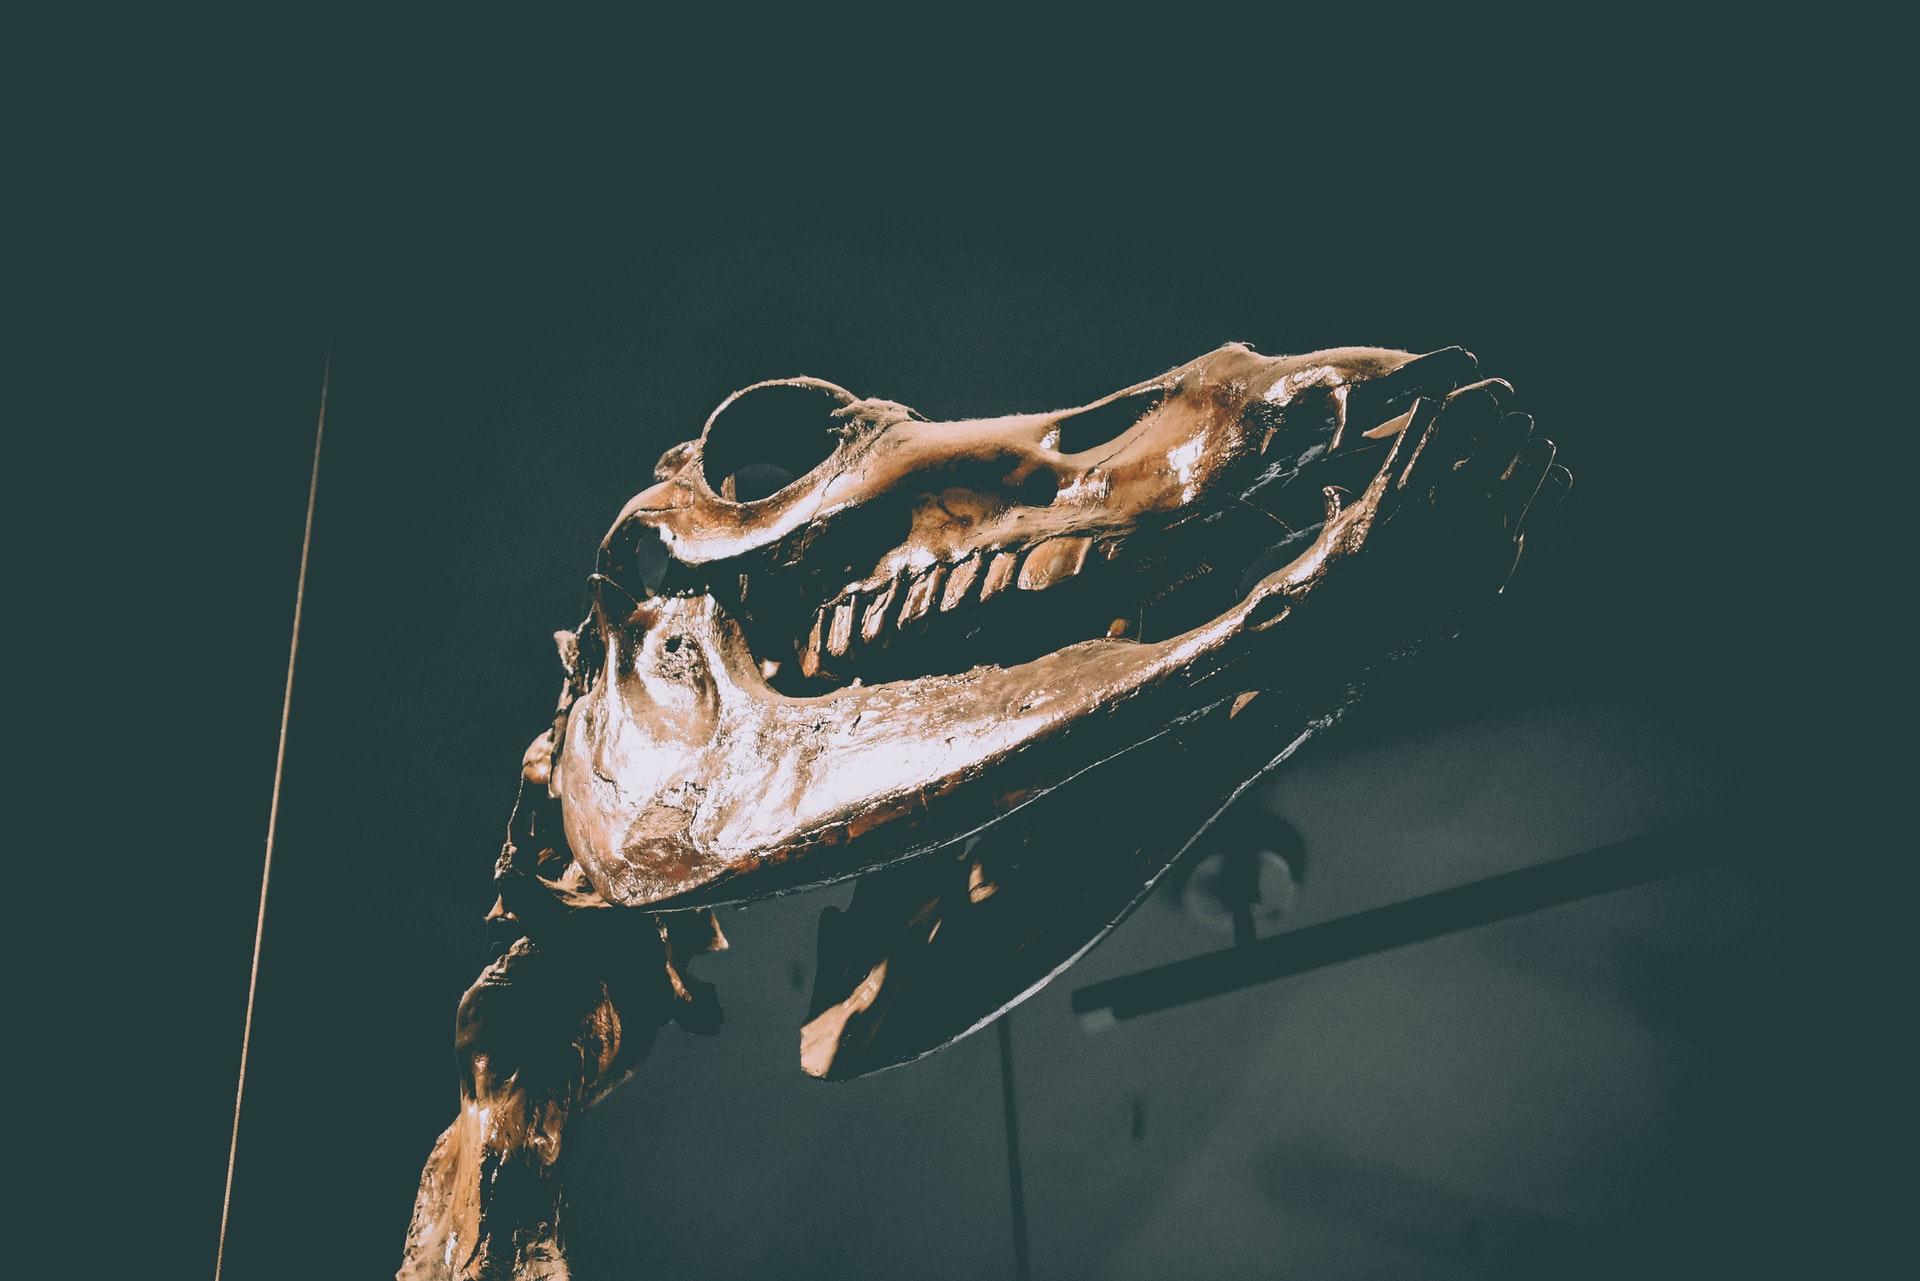 Skull on display at the La Brea Tar Pits